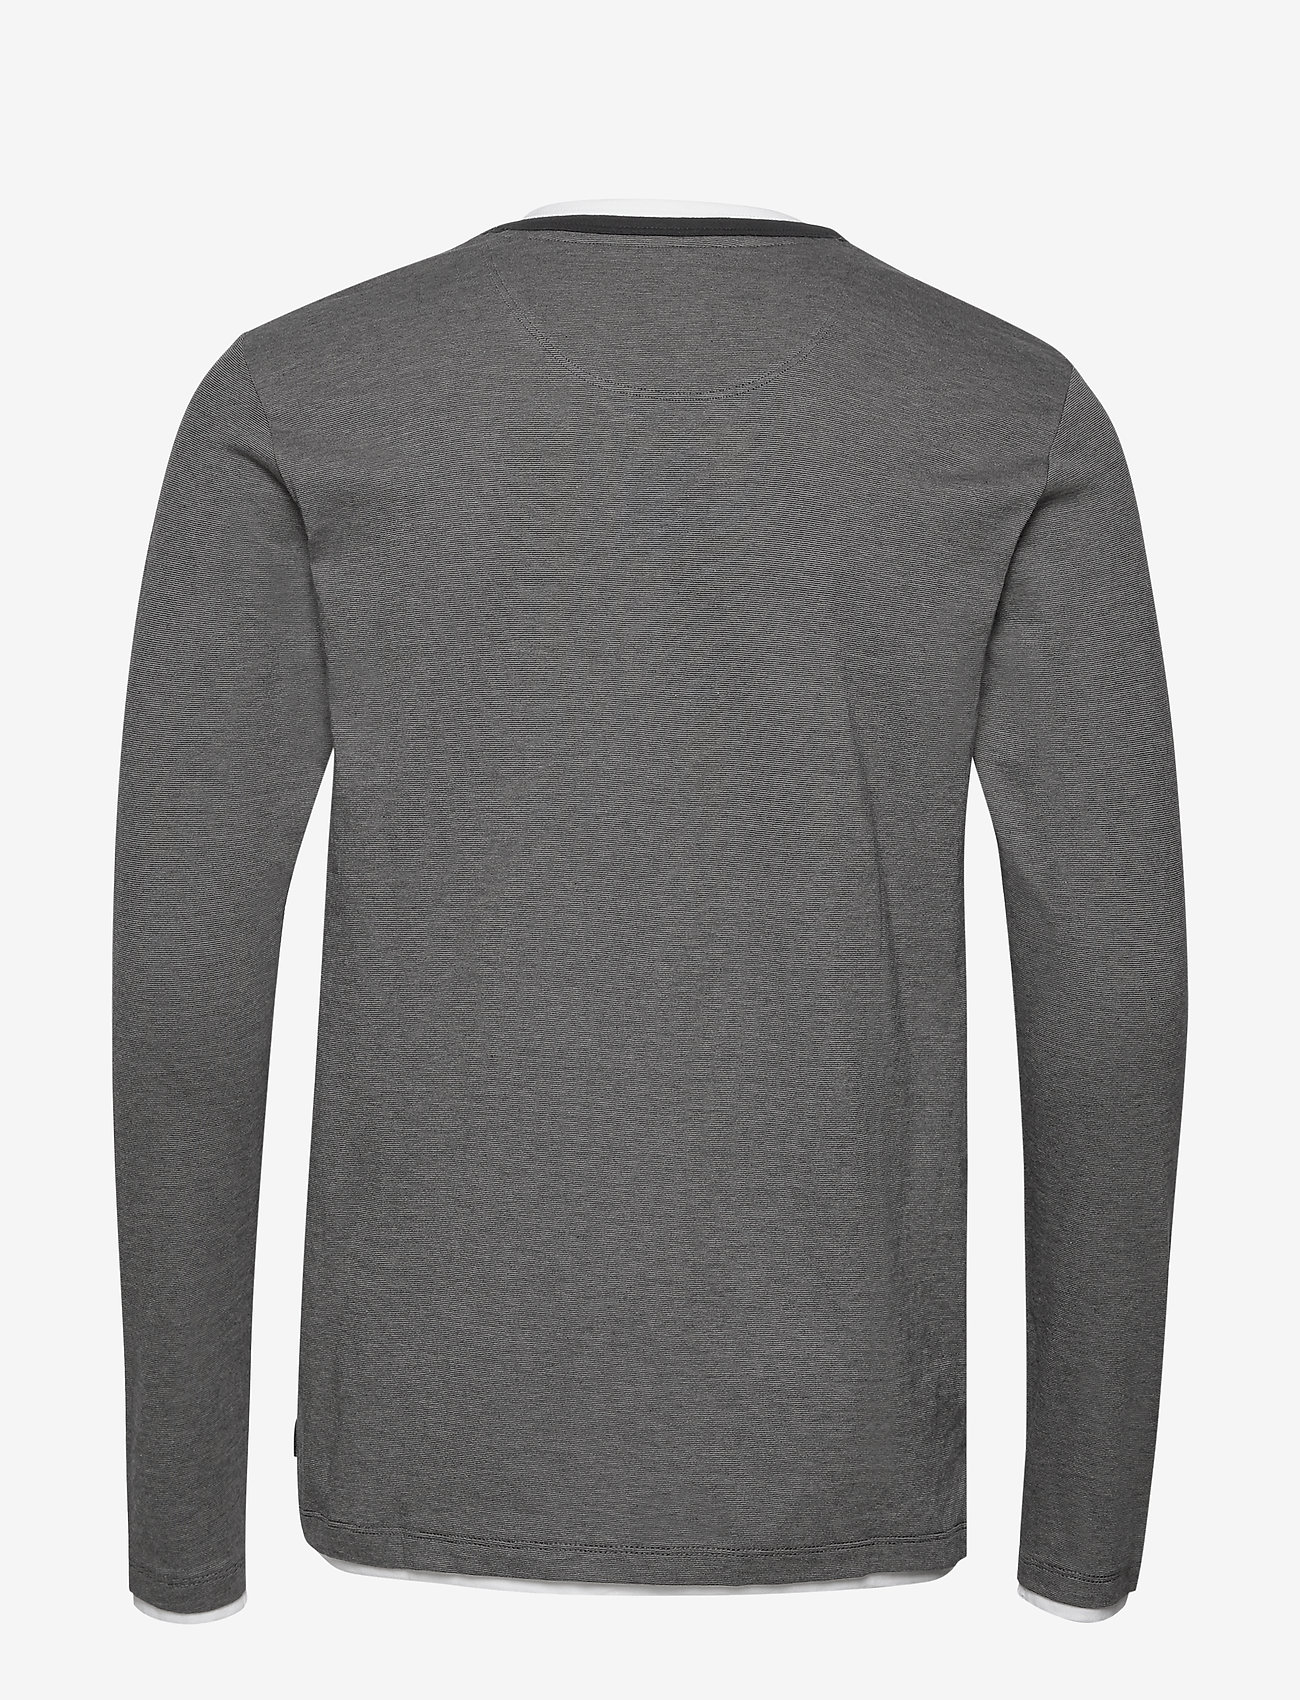 Esprit Casual - T-Shirts - basic t-shirts - black 3 - 1